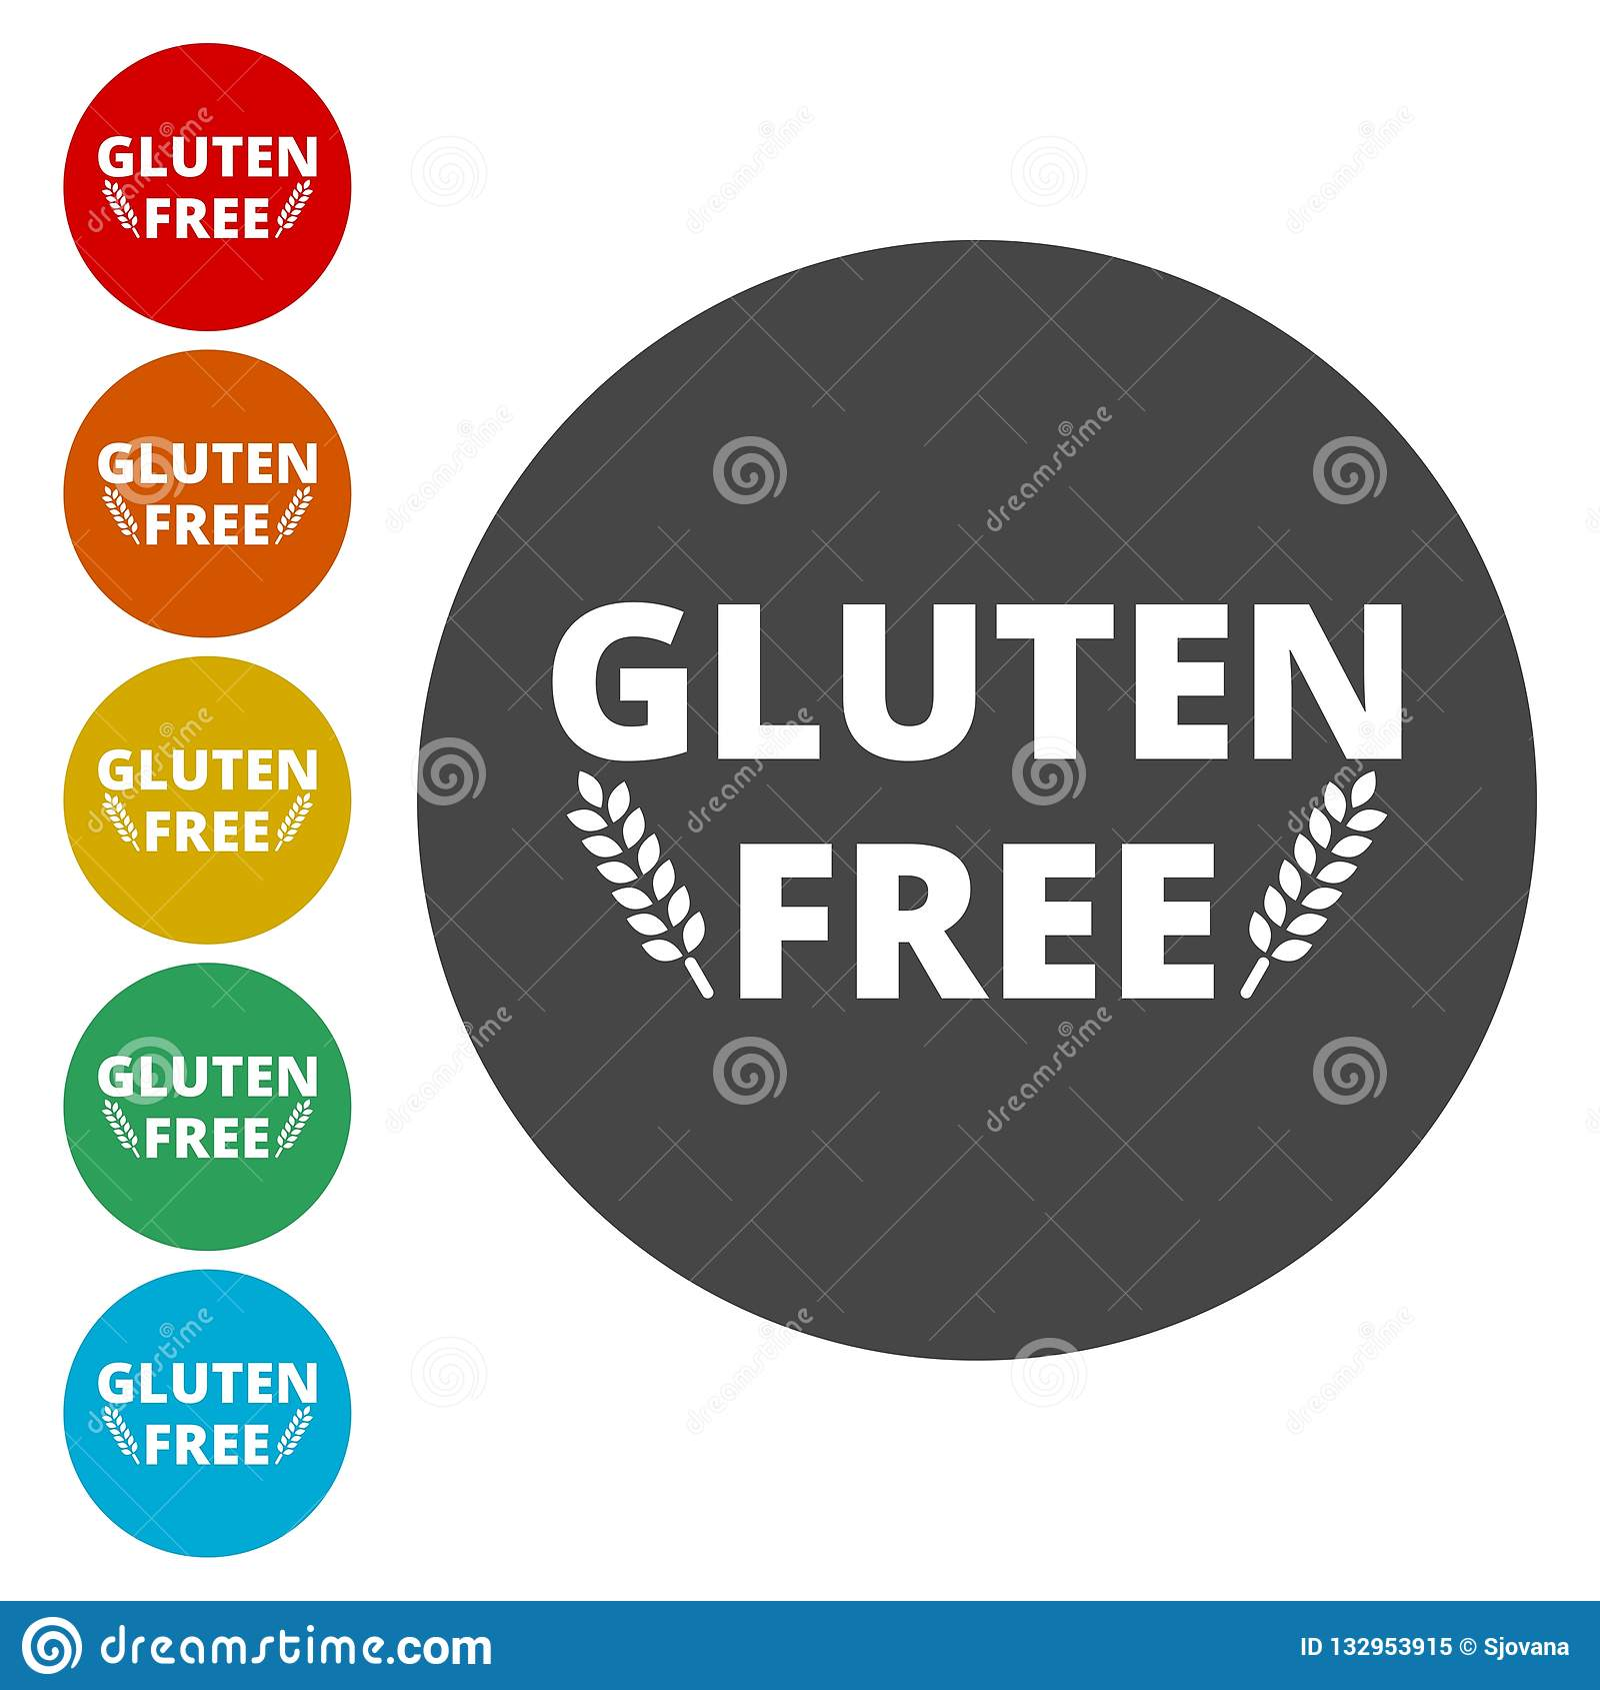 Gluten free icons set stock vector  Illustration of health - 132953915